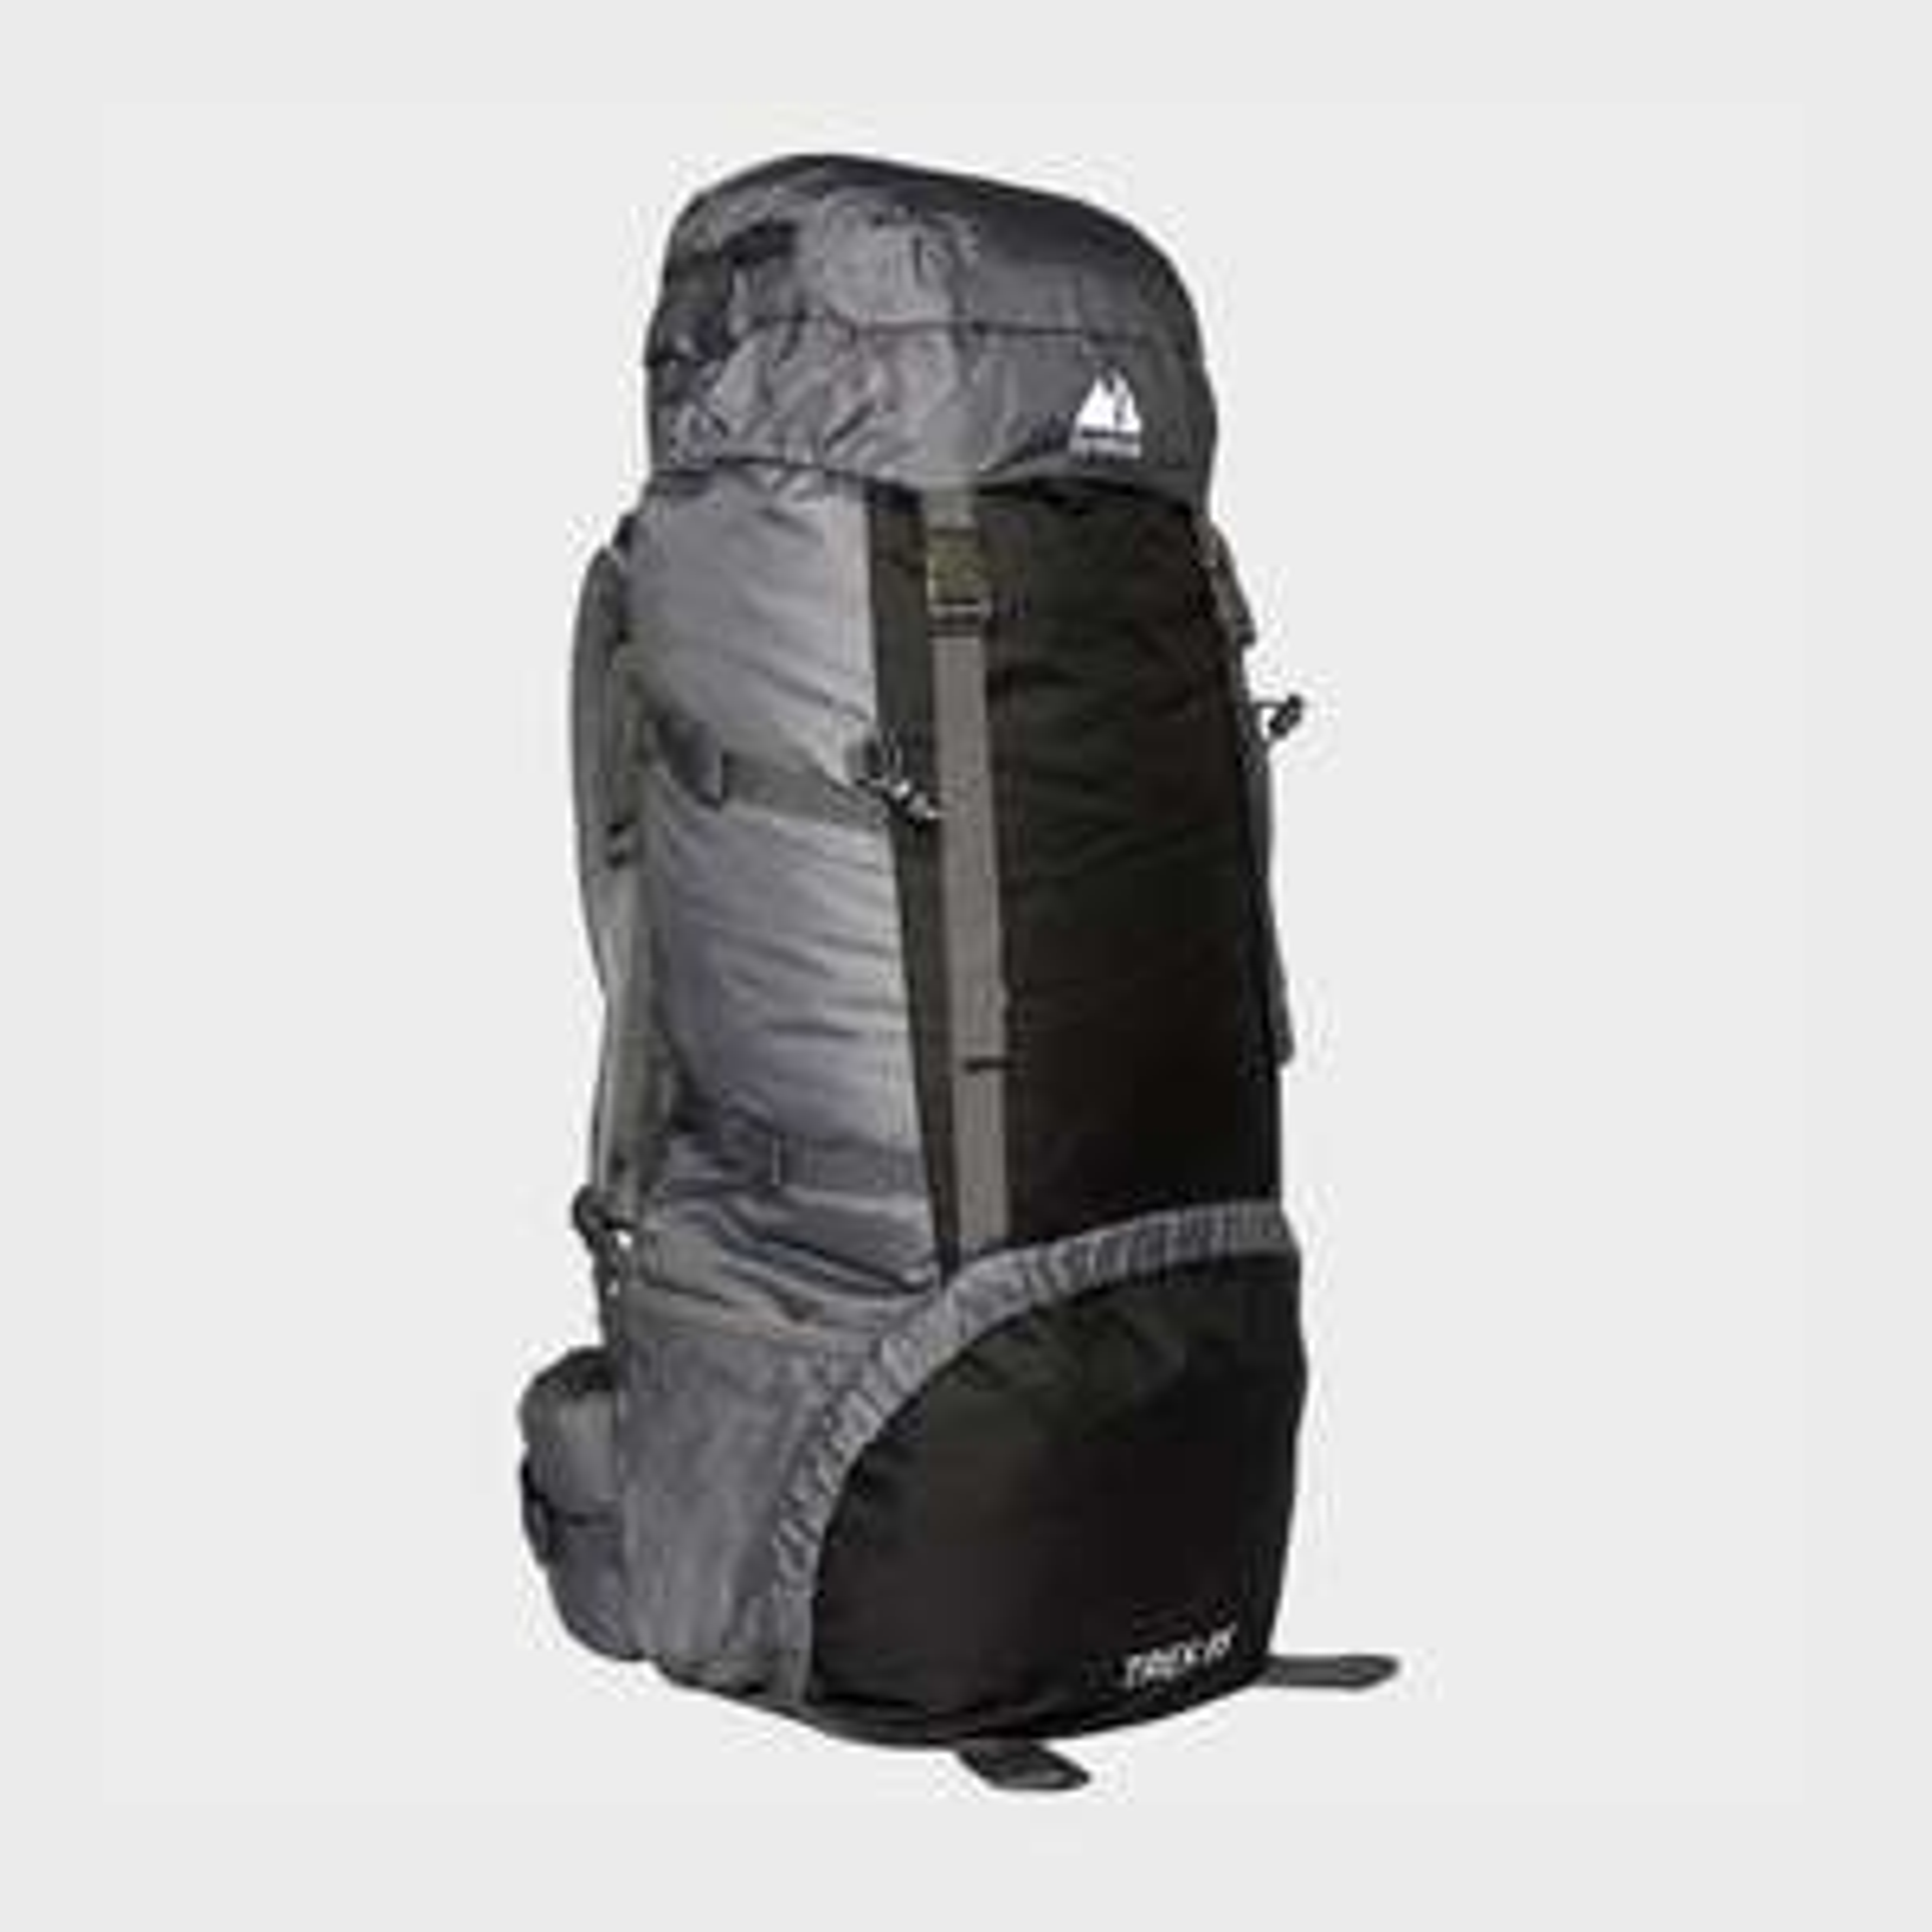 Eurohike Trek 85L rucksack - £16.66 (inc delivery) with code @ Eurohike